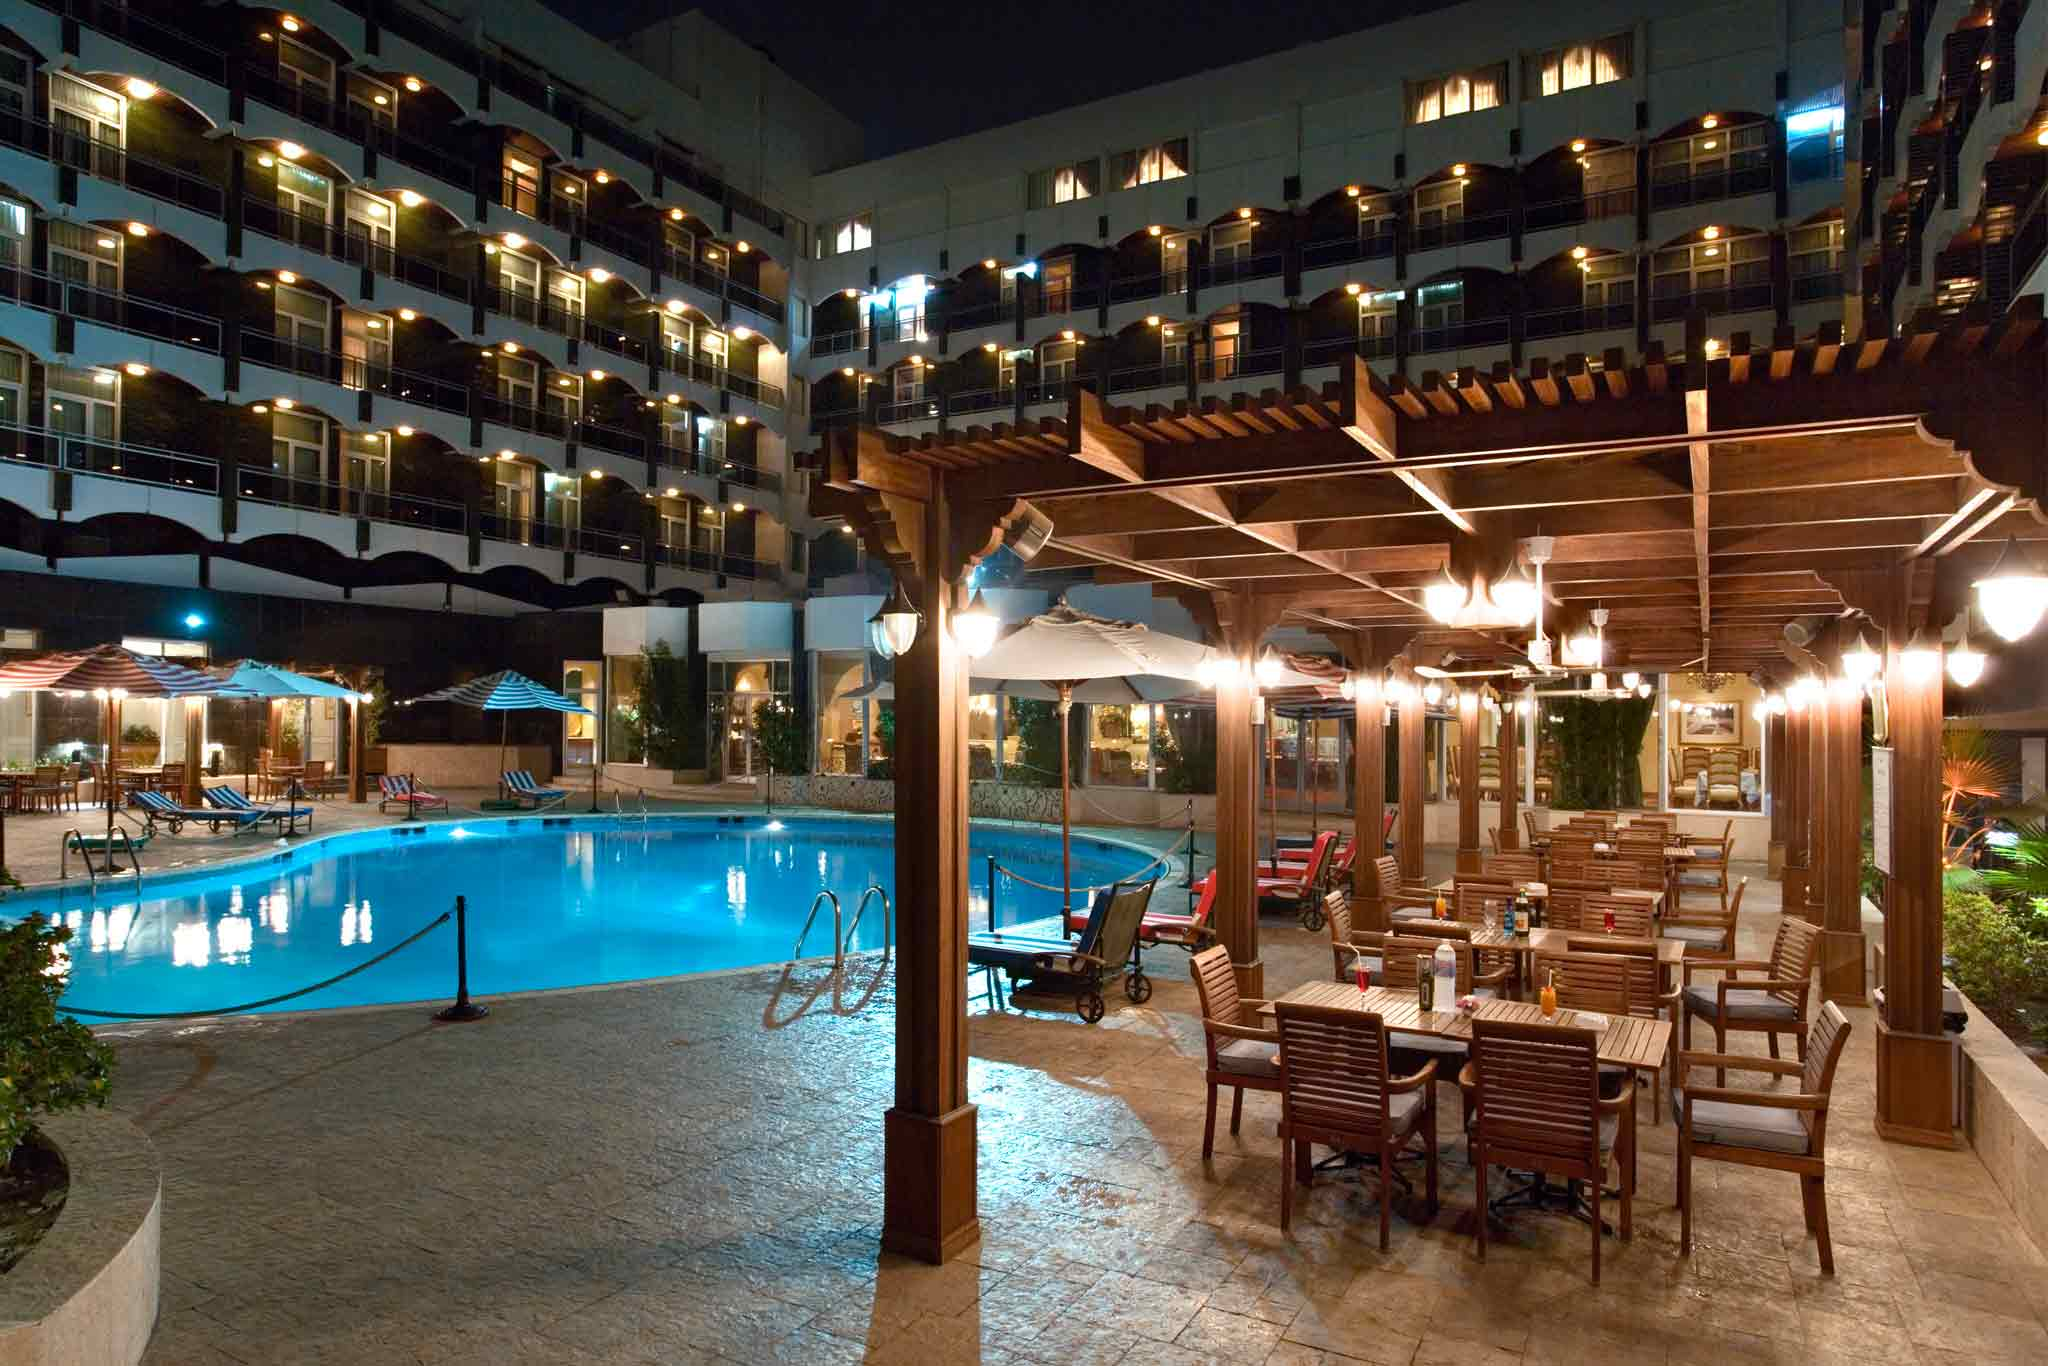 Hôtel - Al Hamra Hotel Jeddah géré par Accorhotels